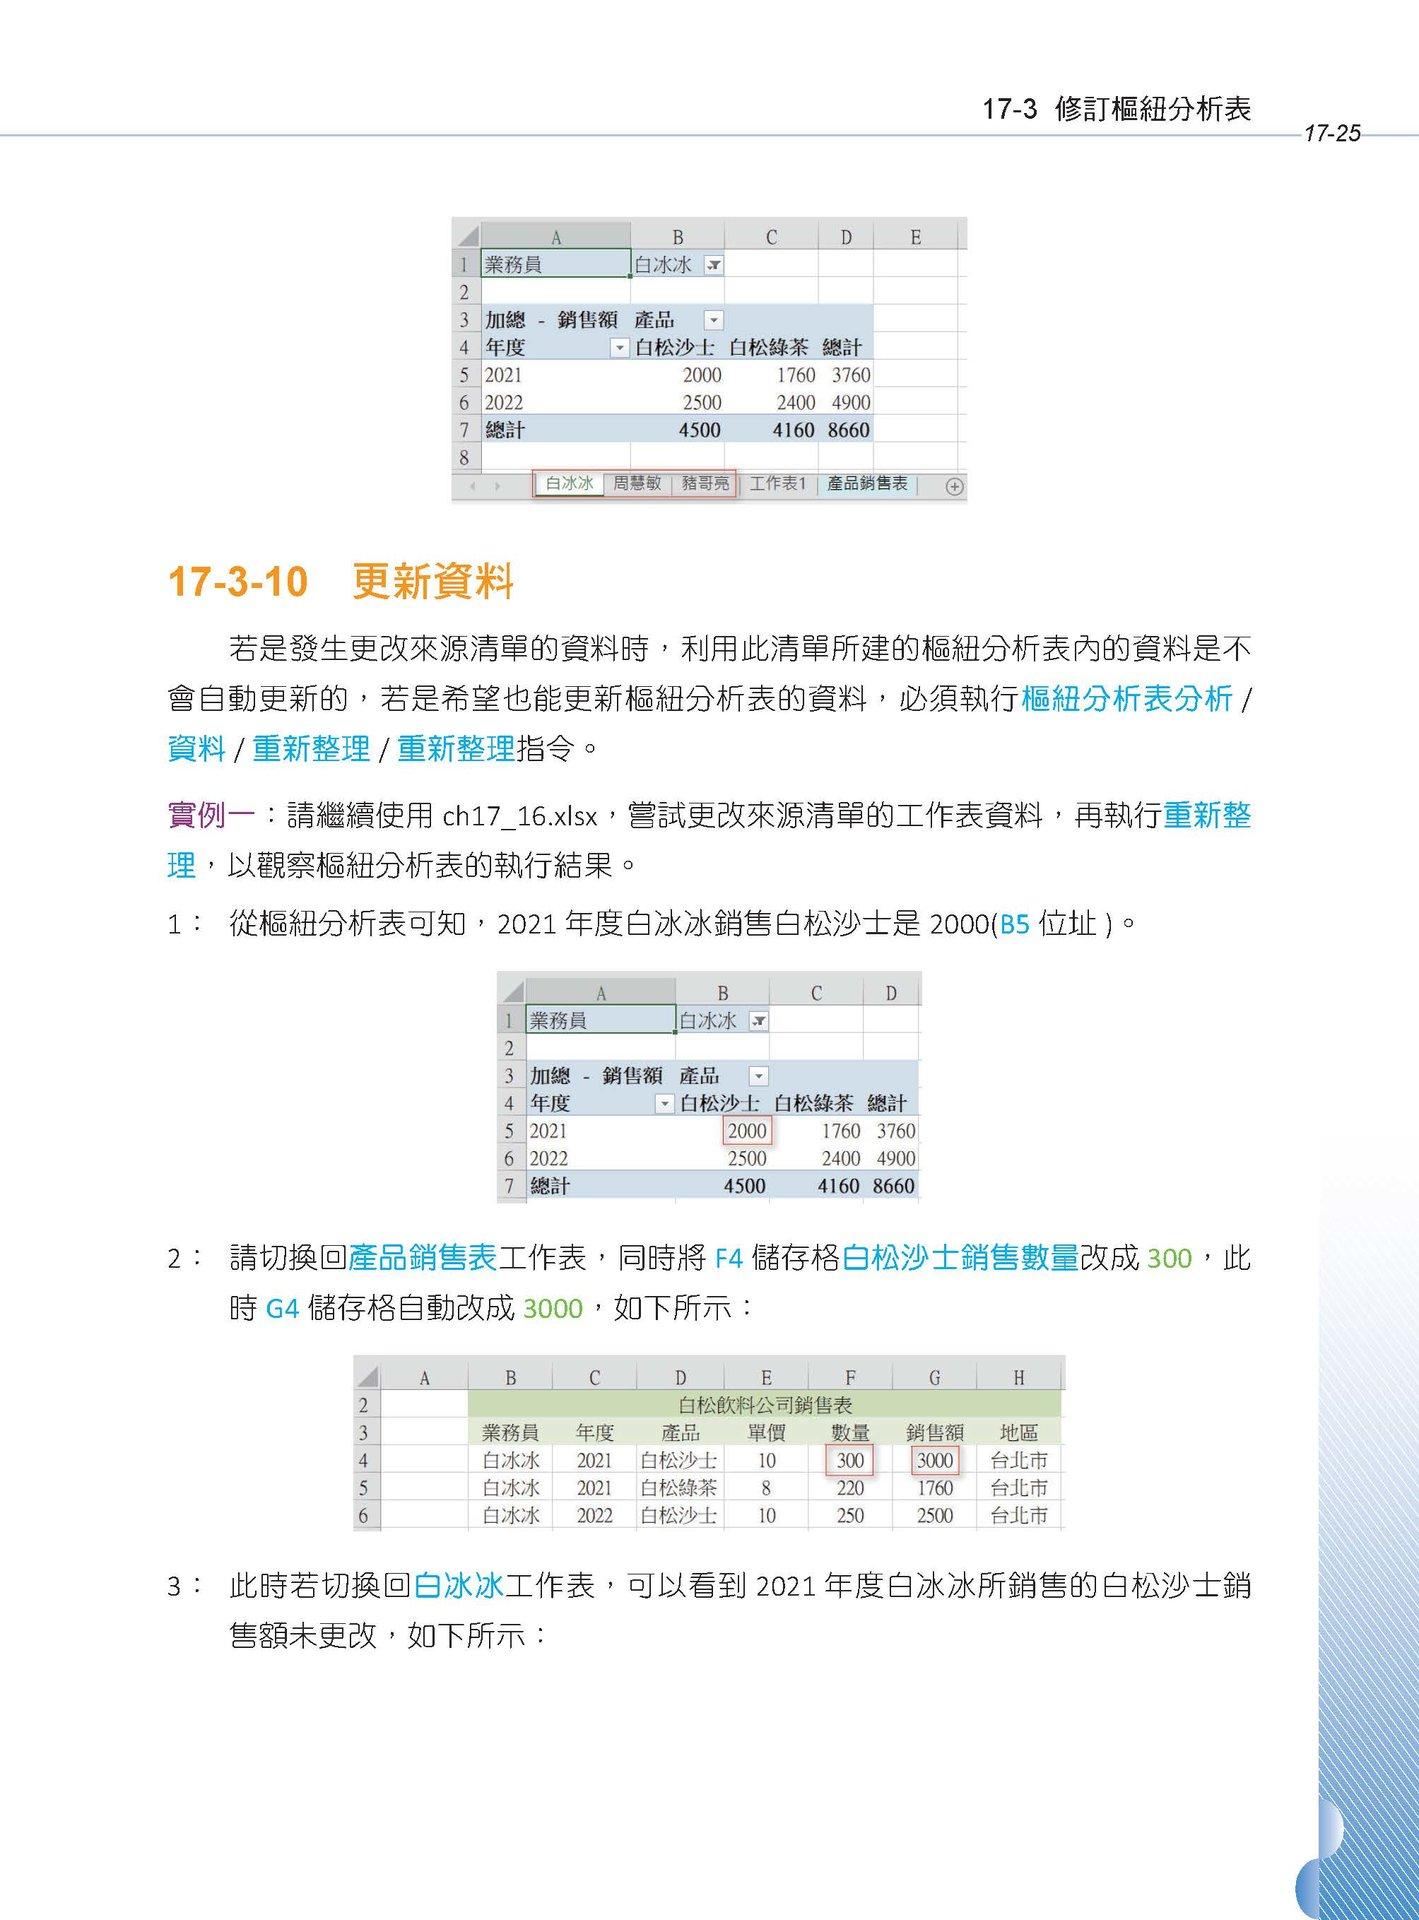 Excel 入門到完整學習 邁向最強職場應用—王者歸來 (全彩印刷)-preview-15